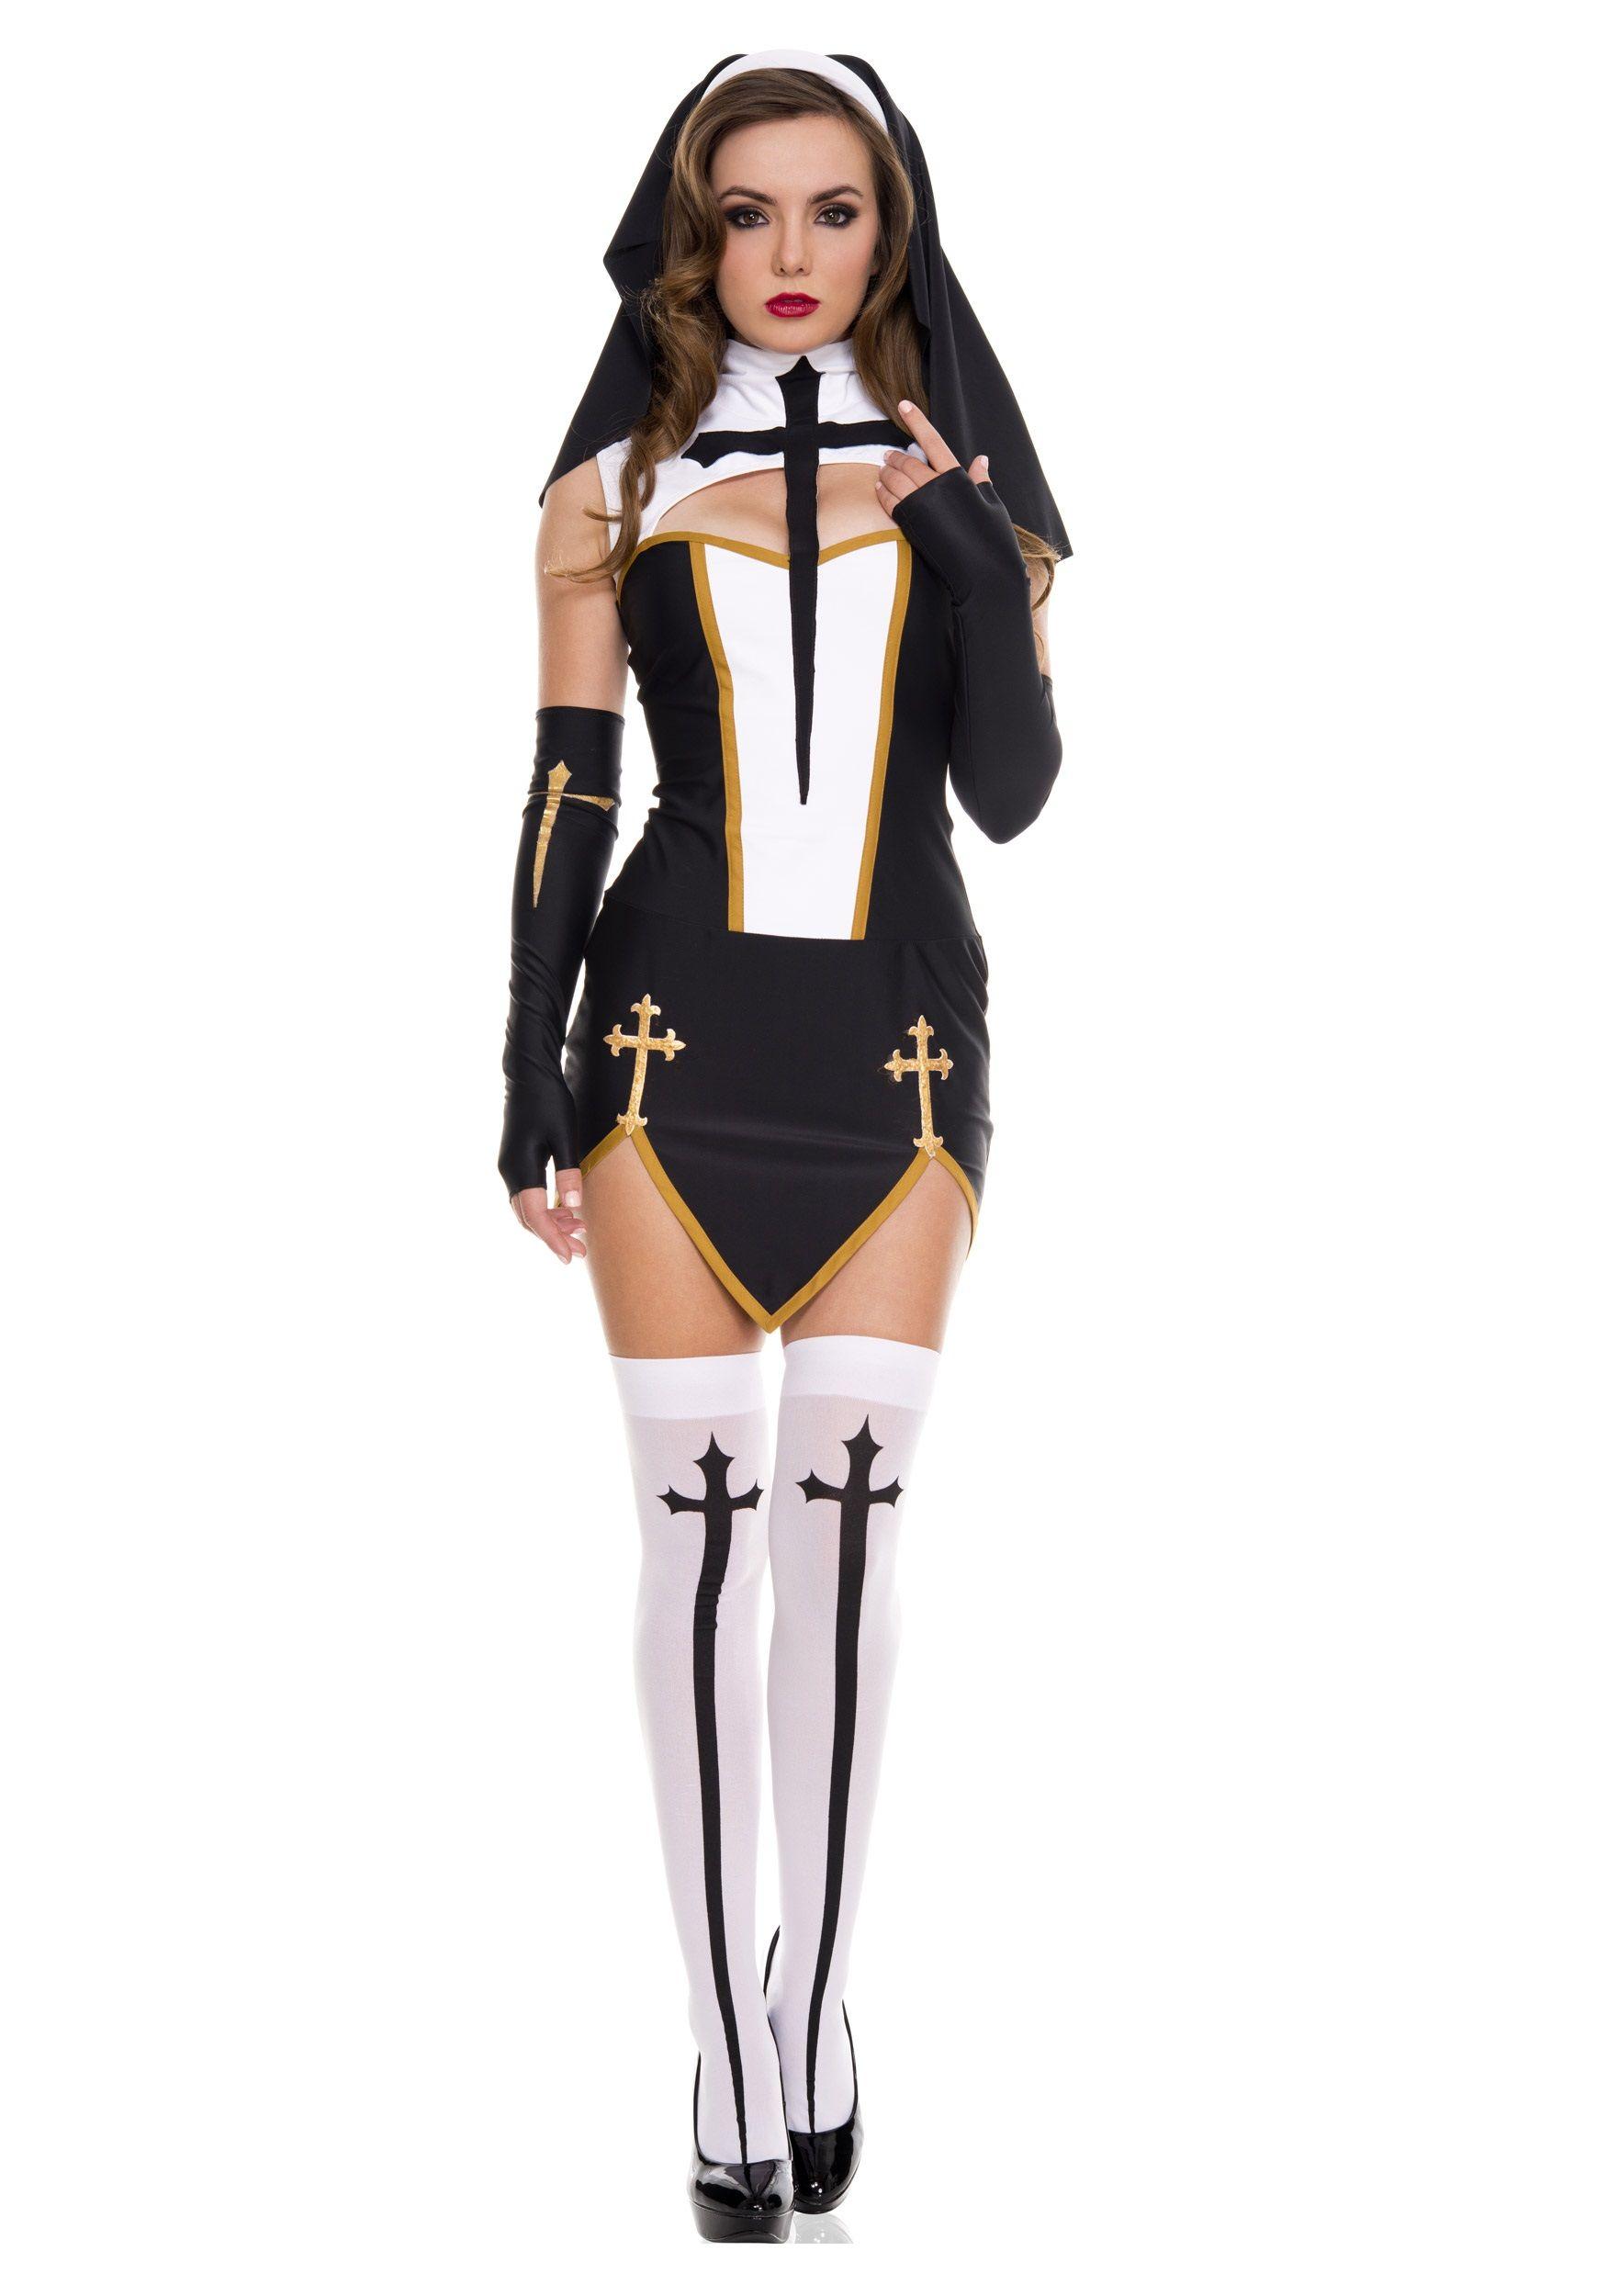 e5e765fd529 Bad Habit Nun Costume. Bad Habit Nun Costume Women Halloween ...